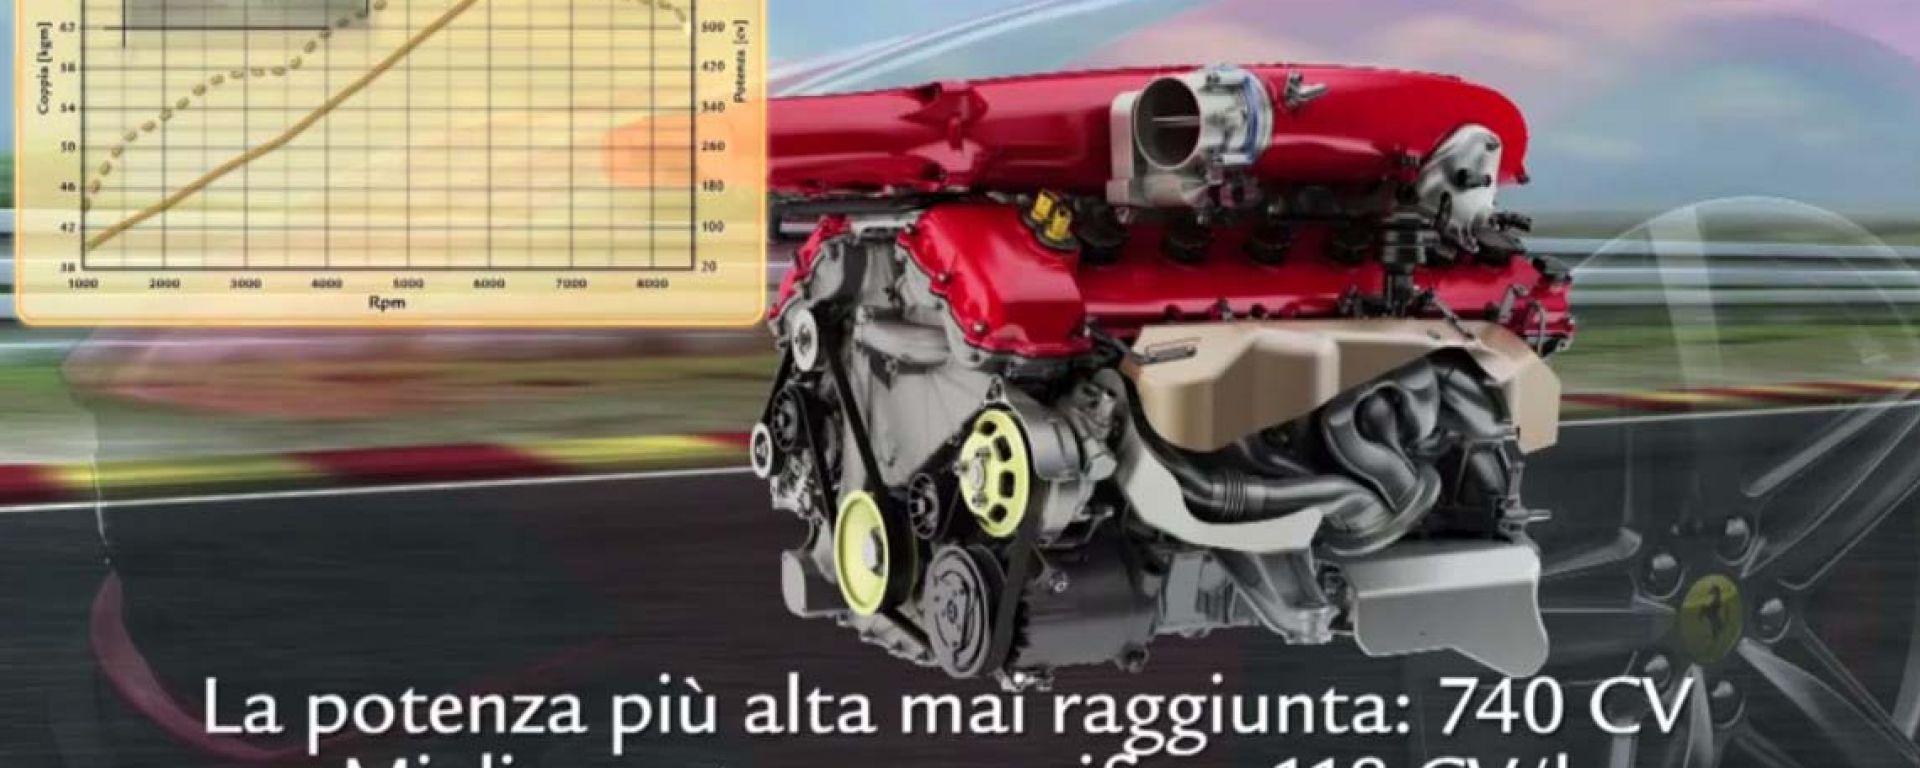 Ferrari F12berlinetta: i segreti del motore